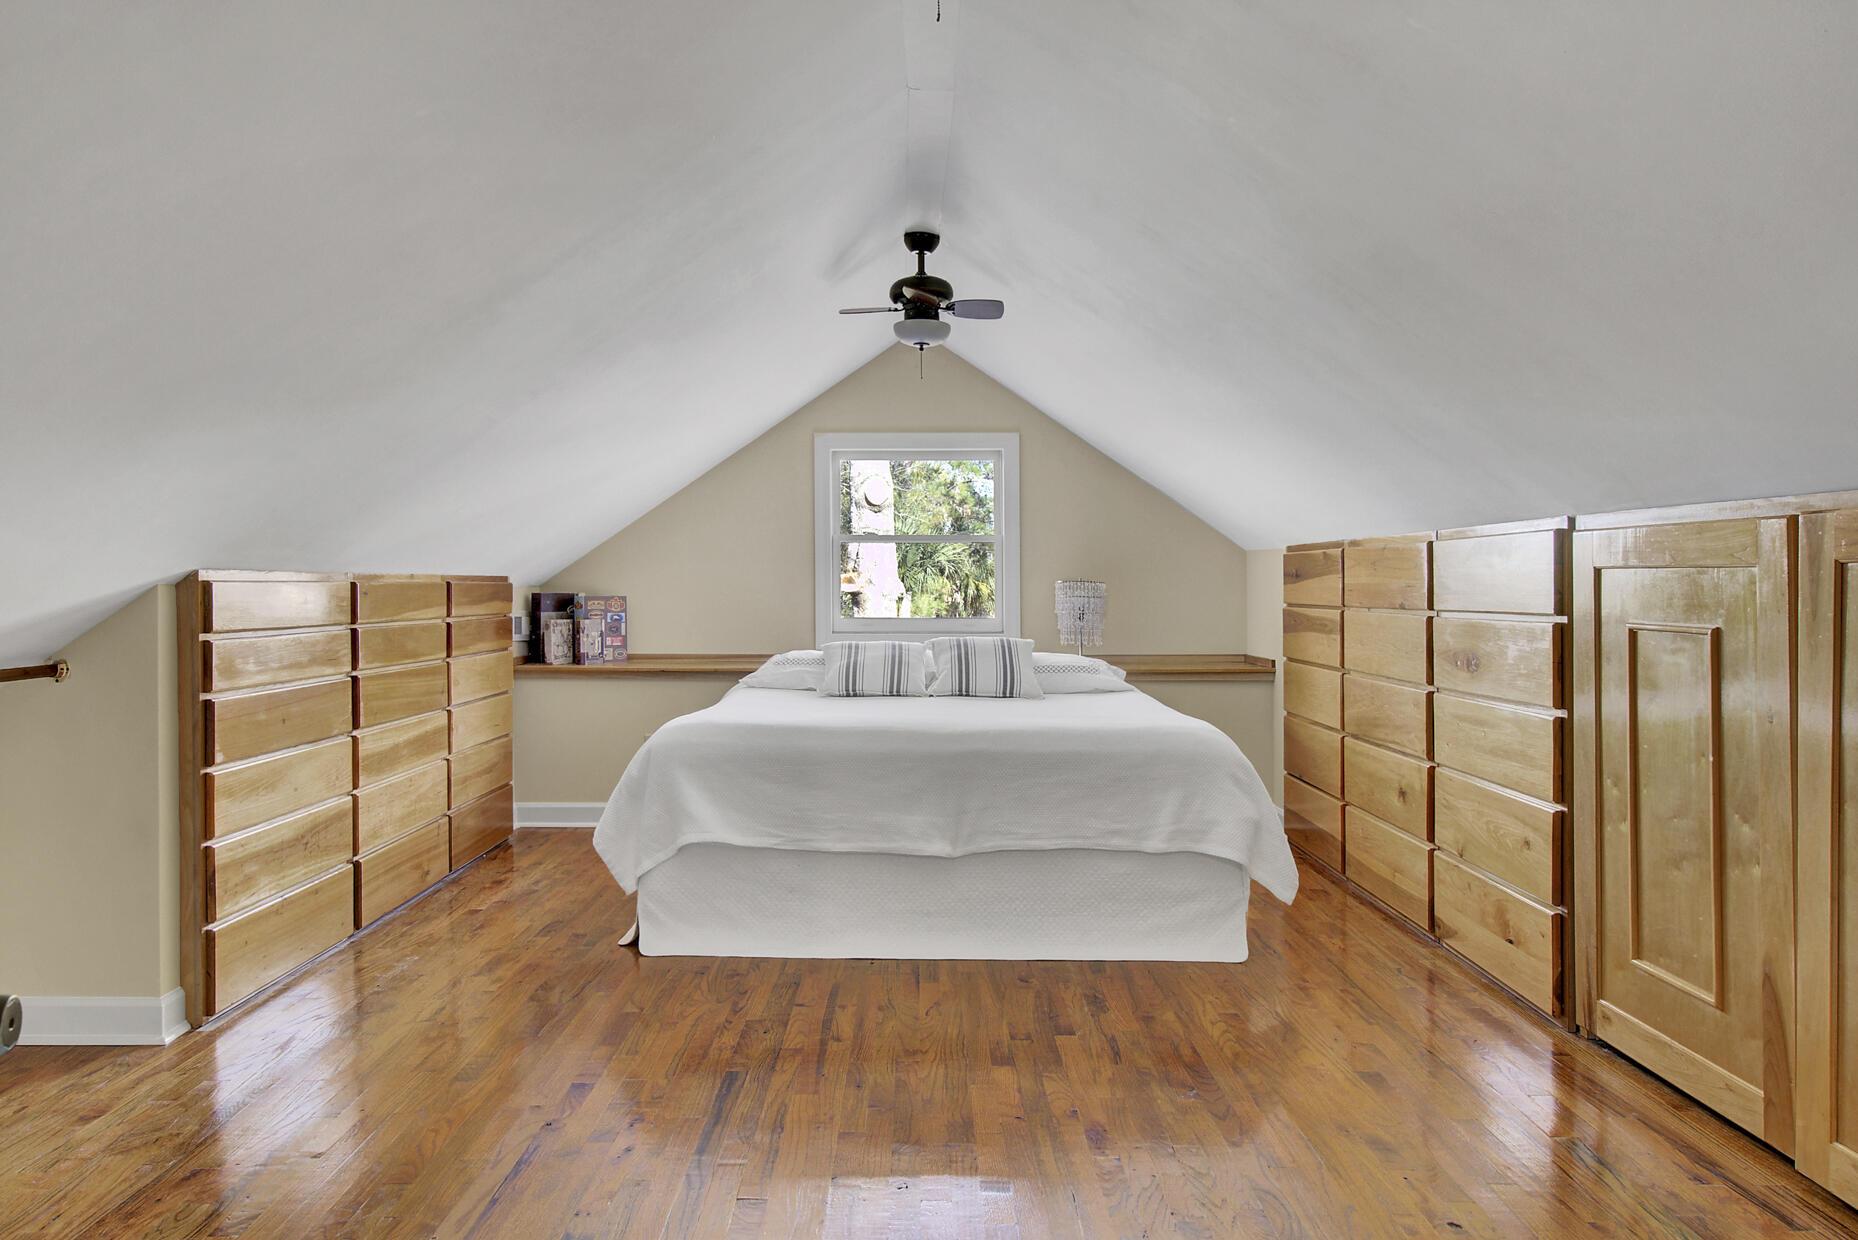 Dunes West Homes For Sale - 4123 Colonel Vanderhorst, Mount Pleasant, SC - 30